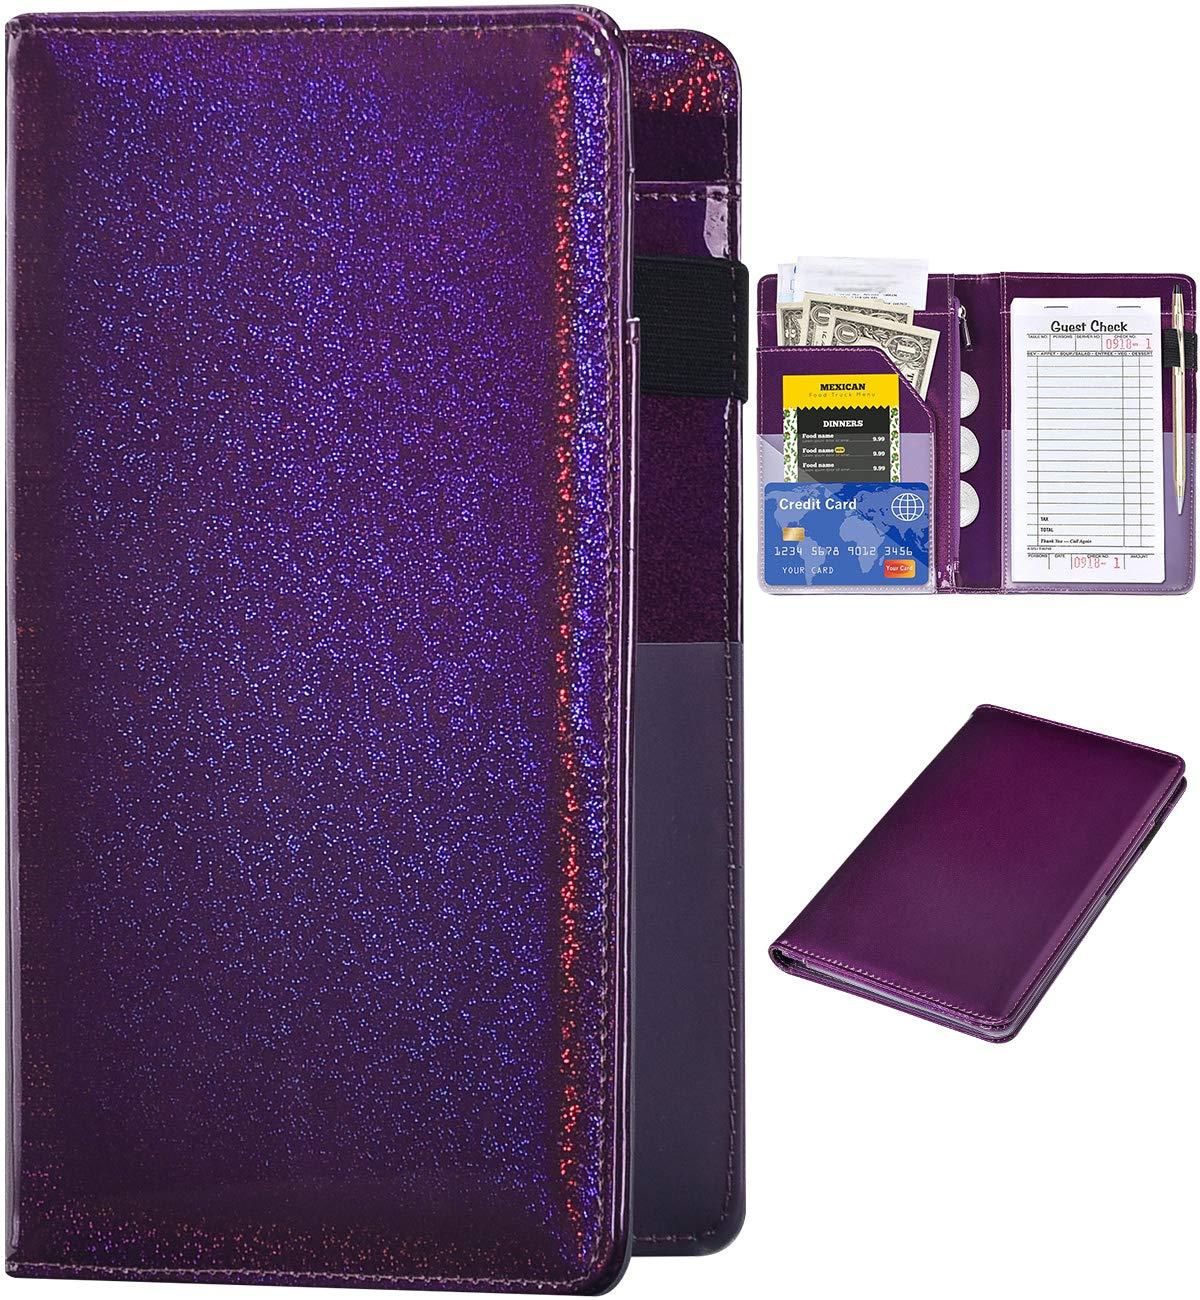 Server Books for Waitress Glitter Leather Waiter Book Server Wallet with Zipper Pocket Cute Waitress Book/&Waitstaff Organizer with Money Pocket Fit Server Apron